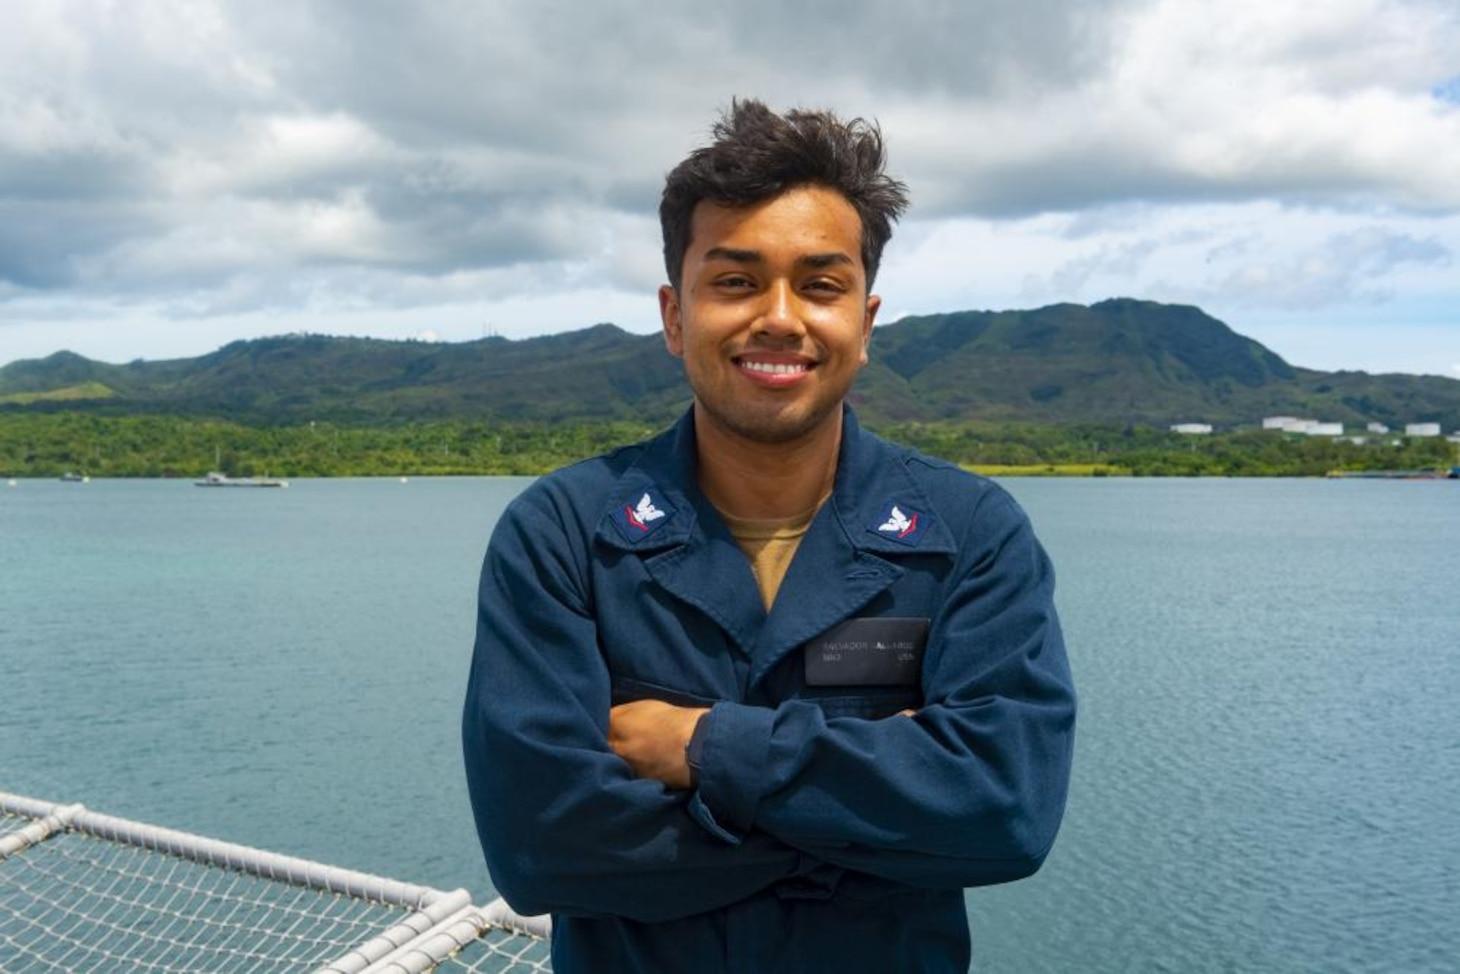 USS Tulsa (LCS 16) Sailor in the Spotlight – Mineman 3rd Class Salvador Gallardo